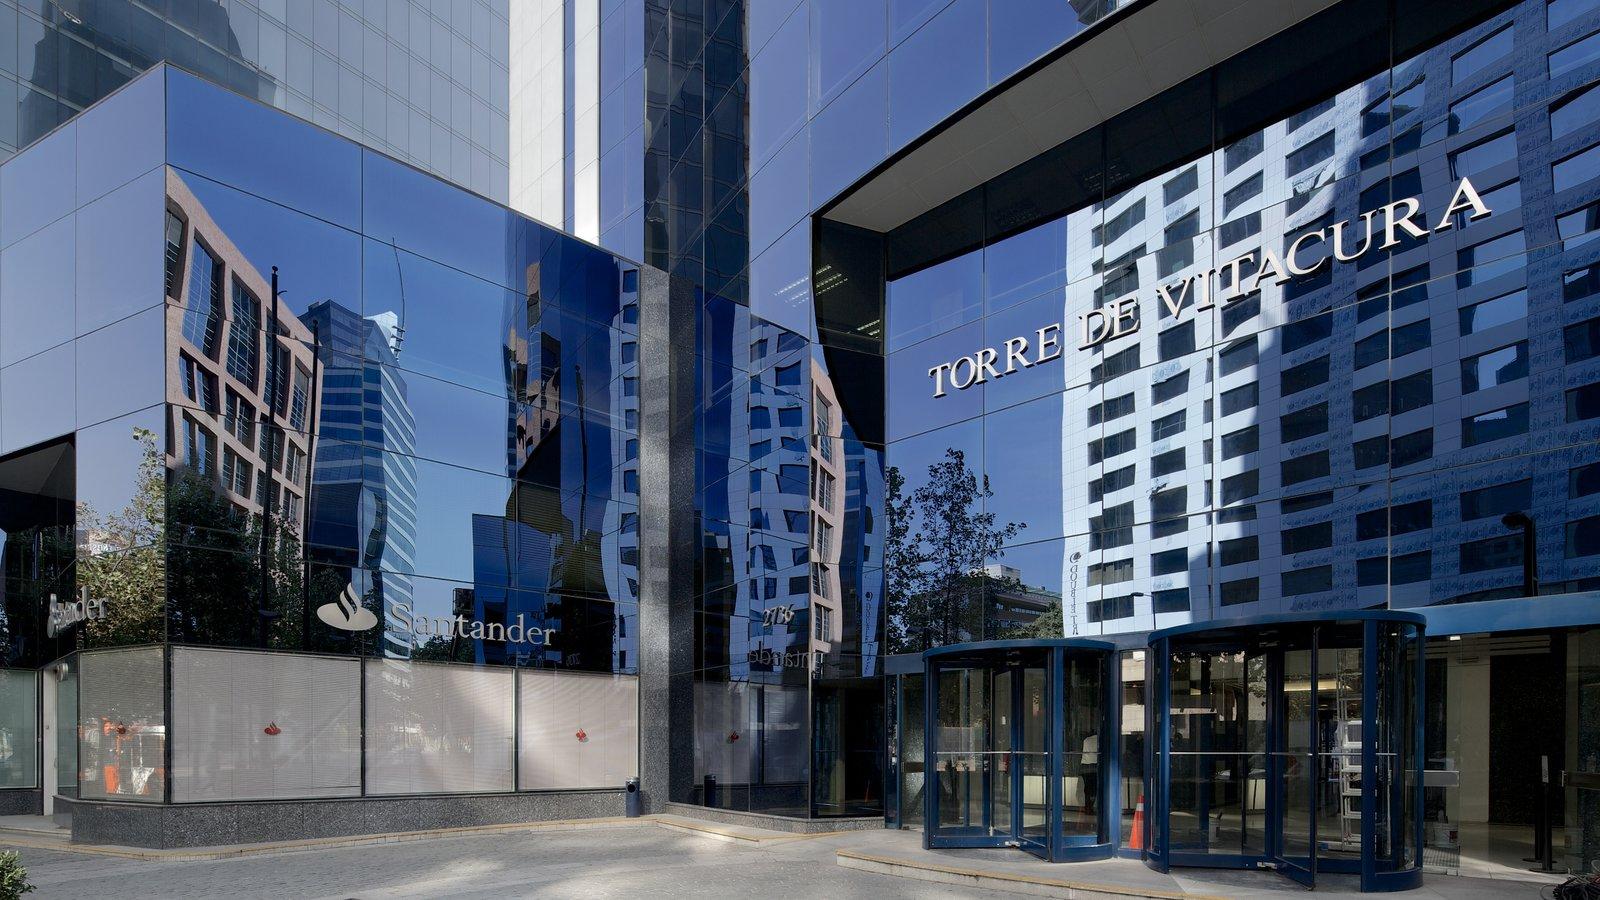 Costanera Center caracterizando arquitetura moderna, distrito comercial central e uma cidade